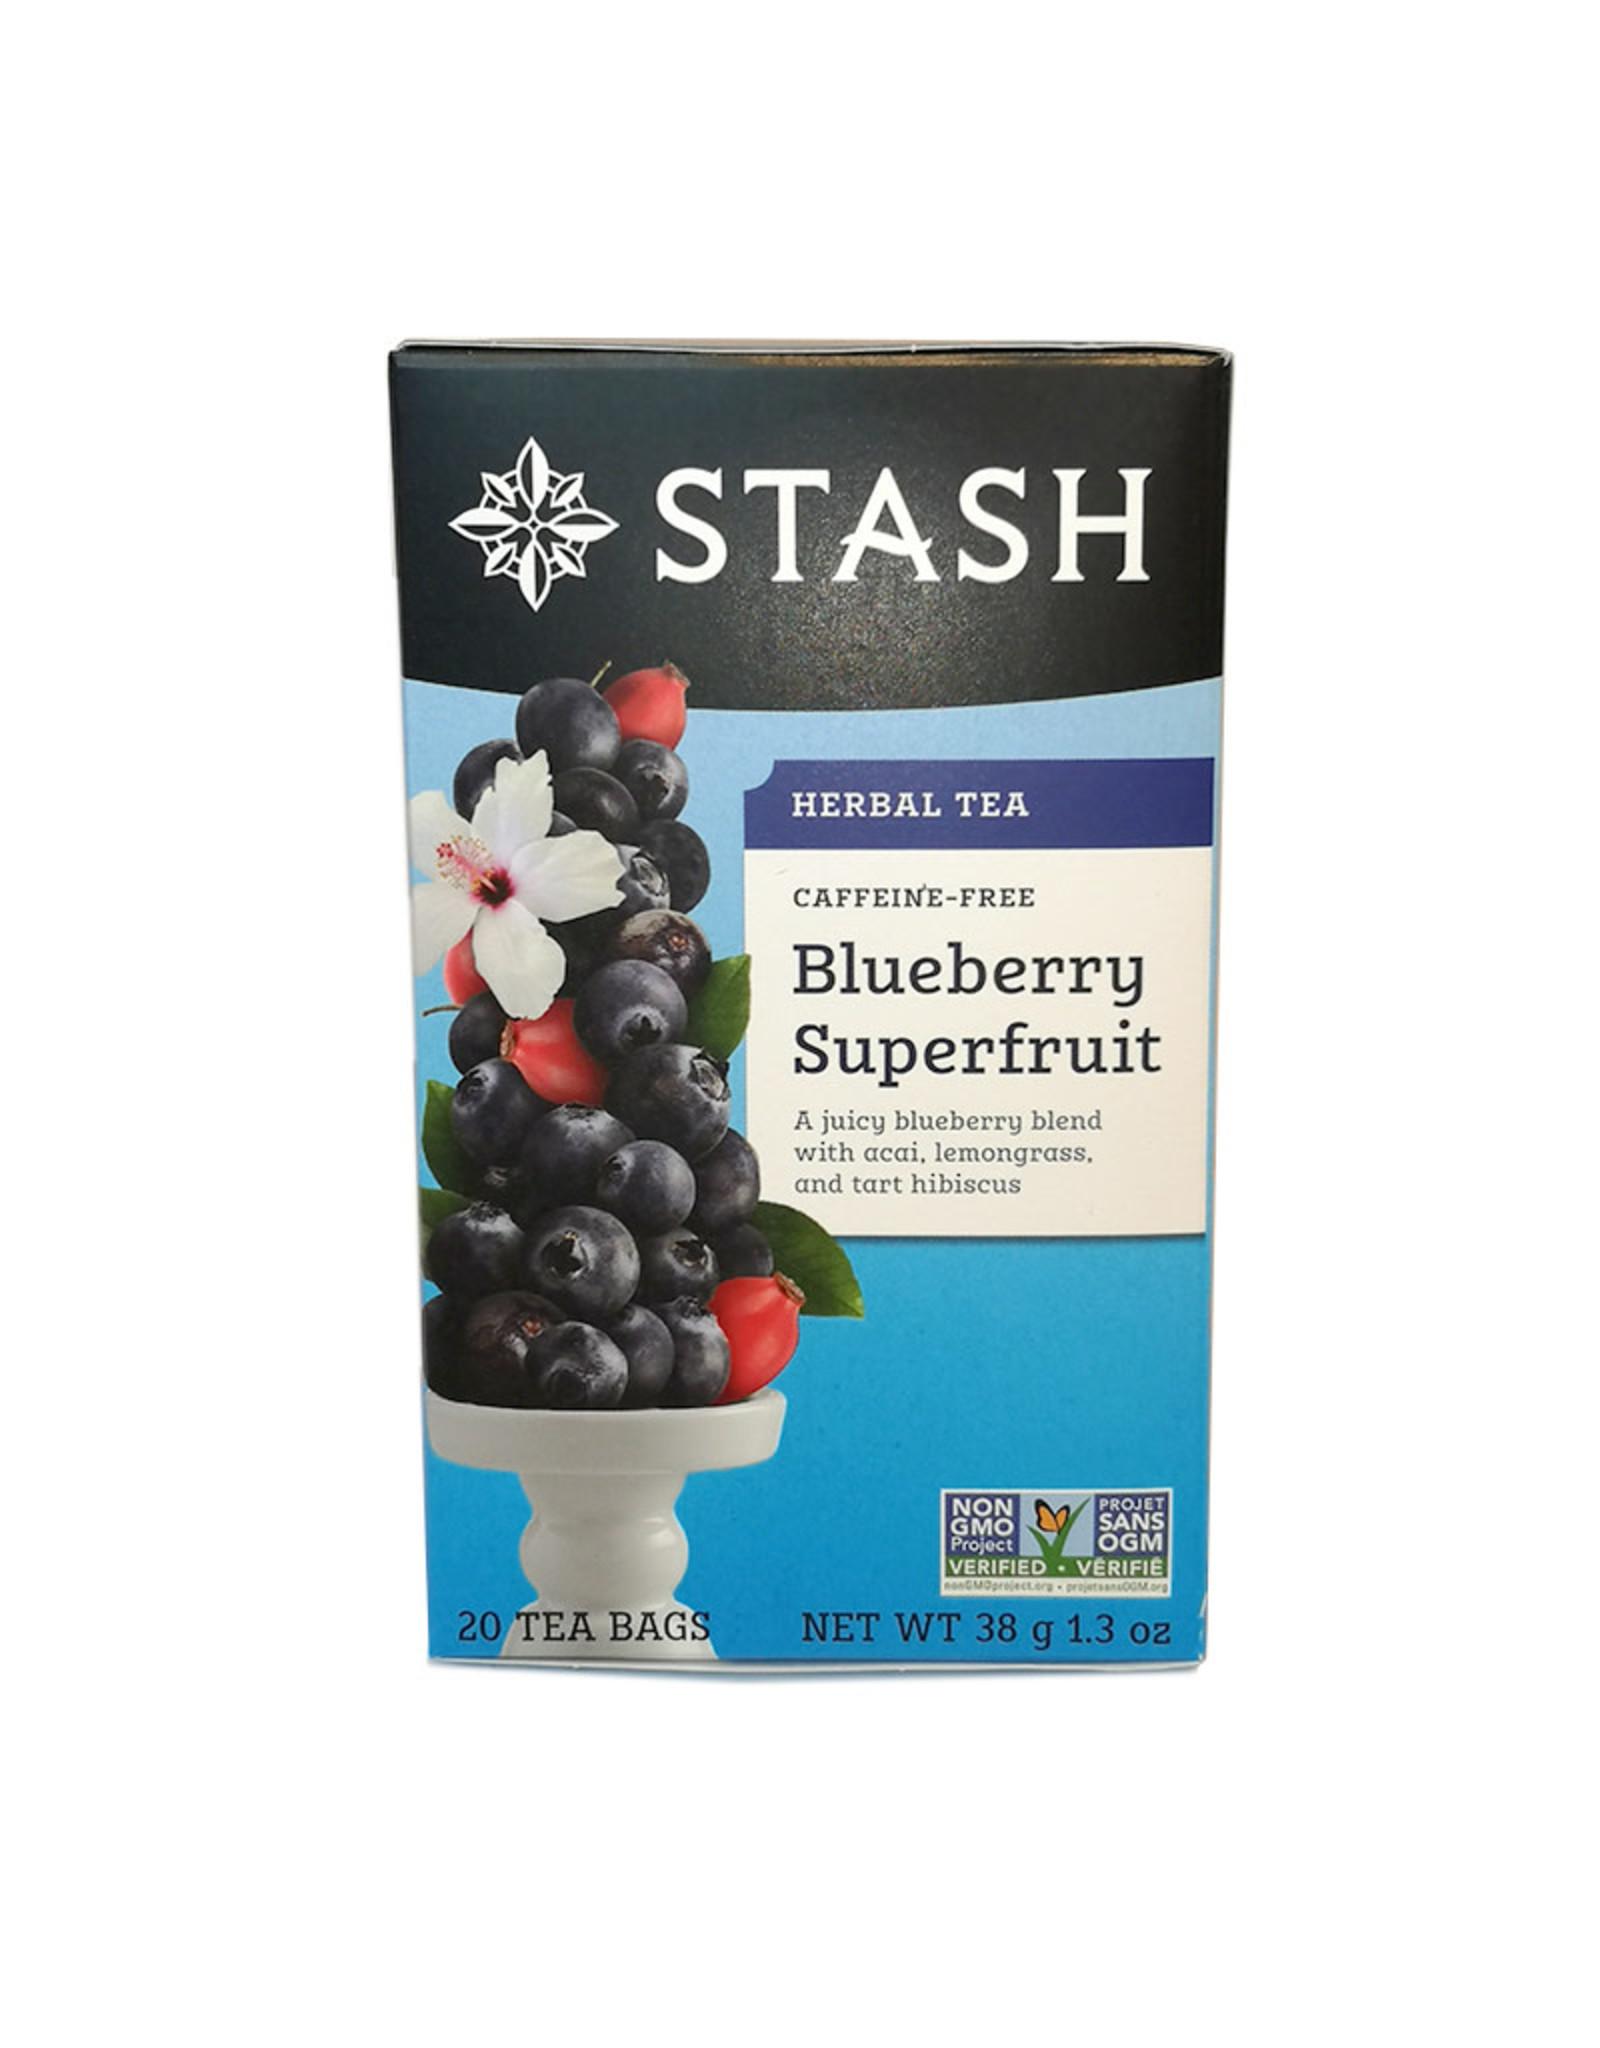 Stash Stash - Tea, Blueberry Superfruit (20bg)